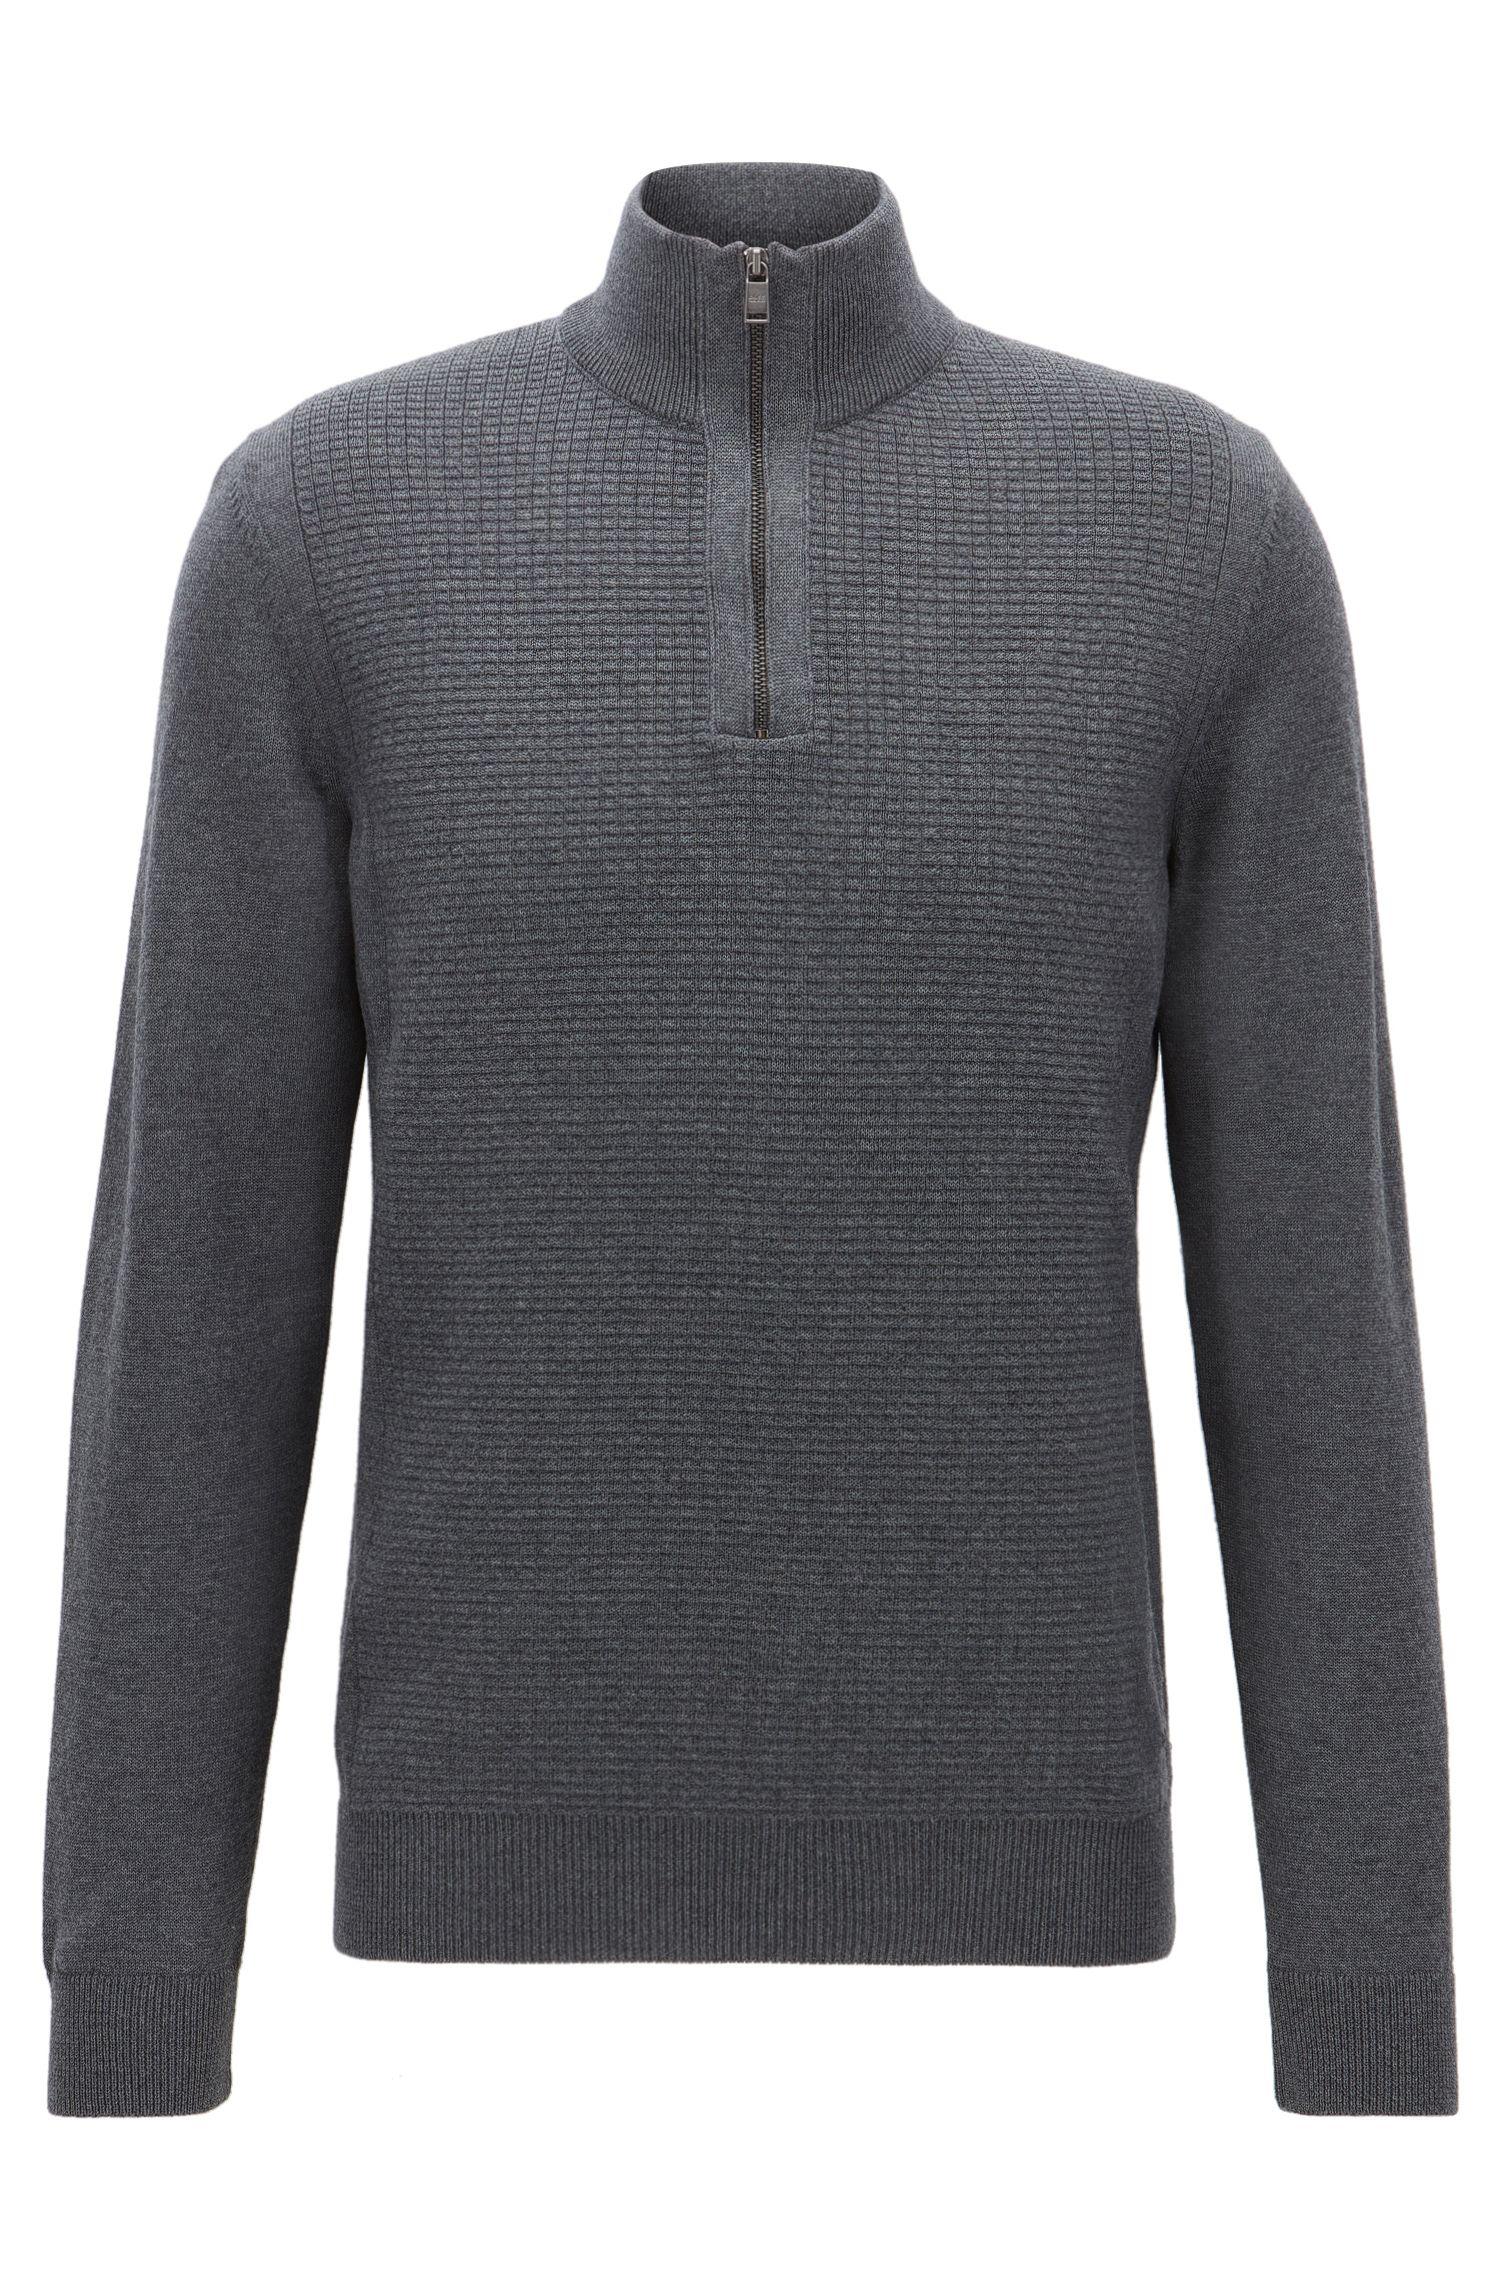 'Nacello' | Virgin Wool Sweater